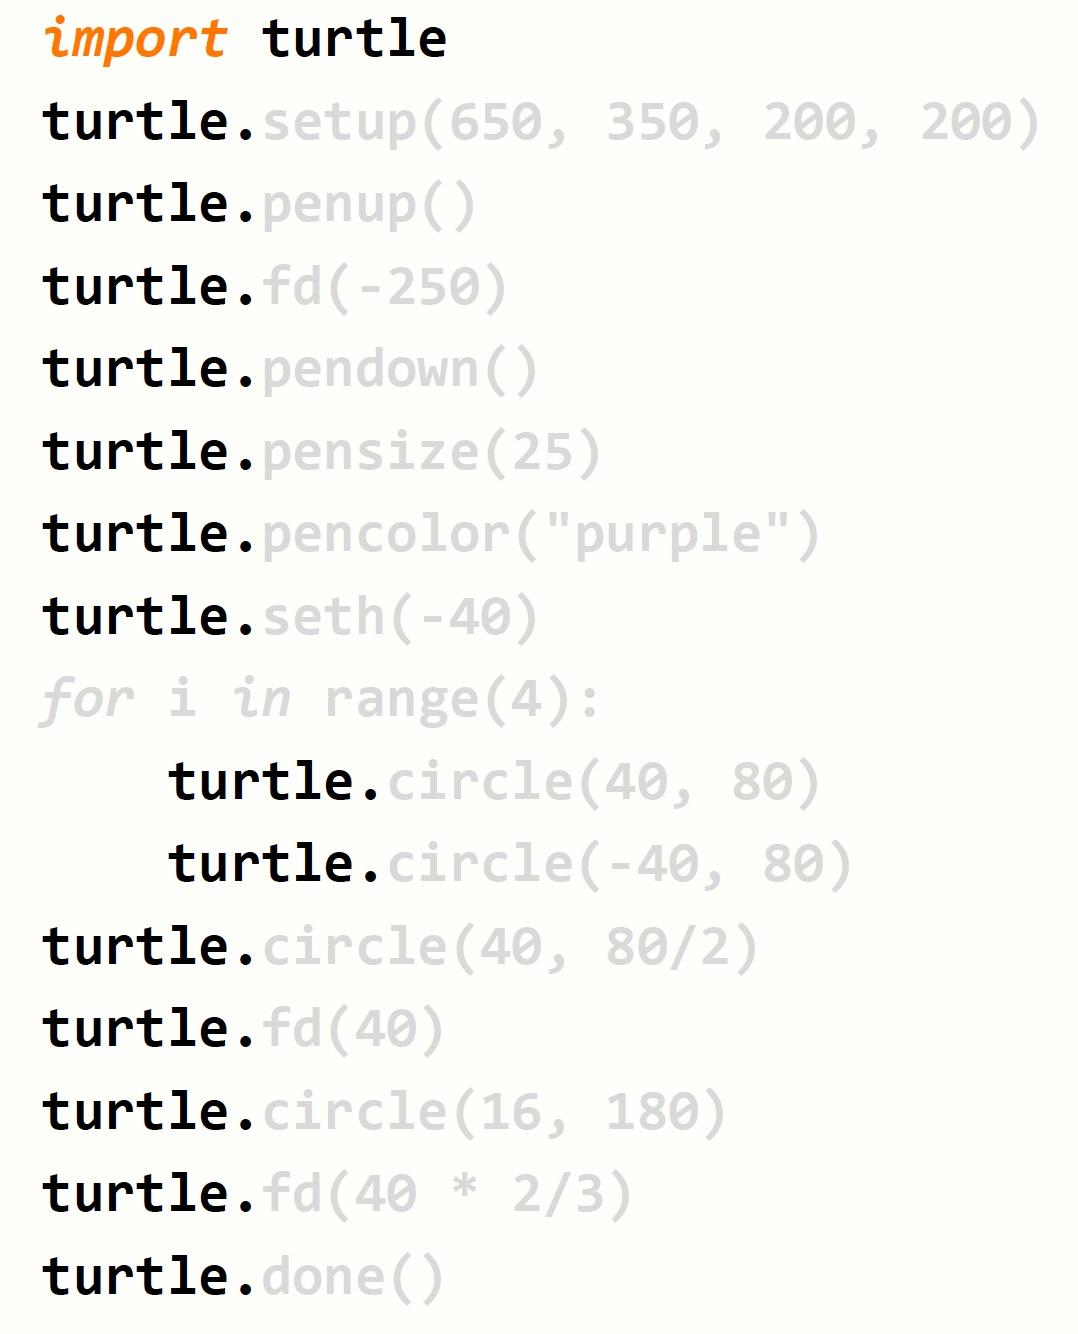 013-turtle程序语法元素分析-01.jpg?x-oss-process=style/watermark